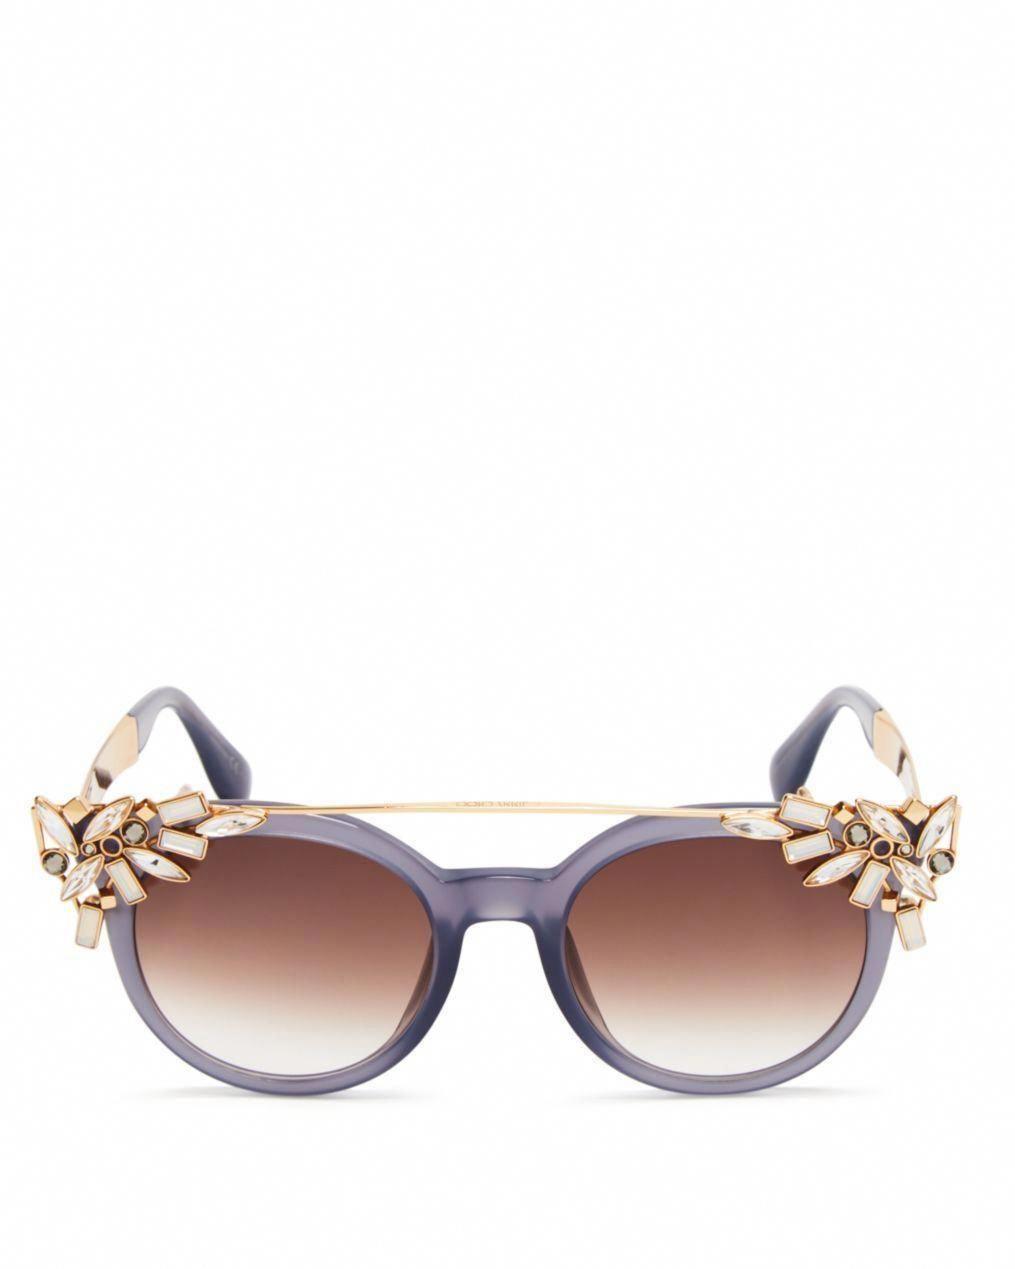 7850ee3e782a Jimmy Choo Vivys Embellished Sunglasses, 51mm #JimmyChoo   Jimmy ...